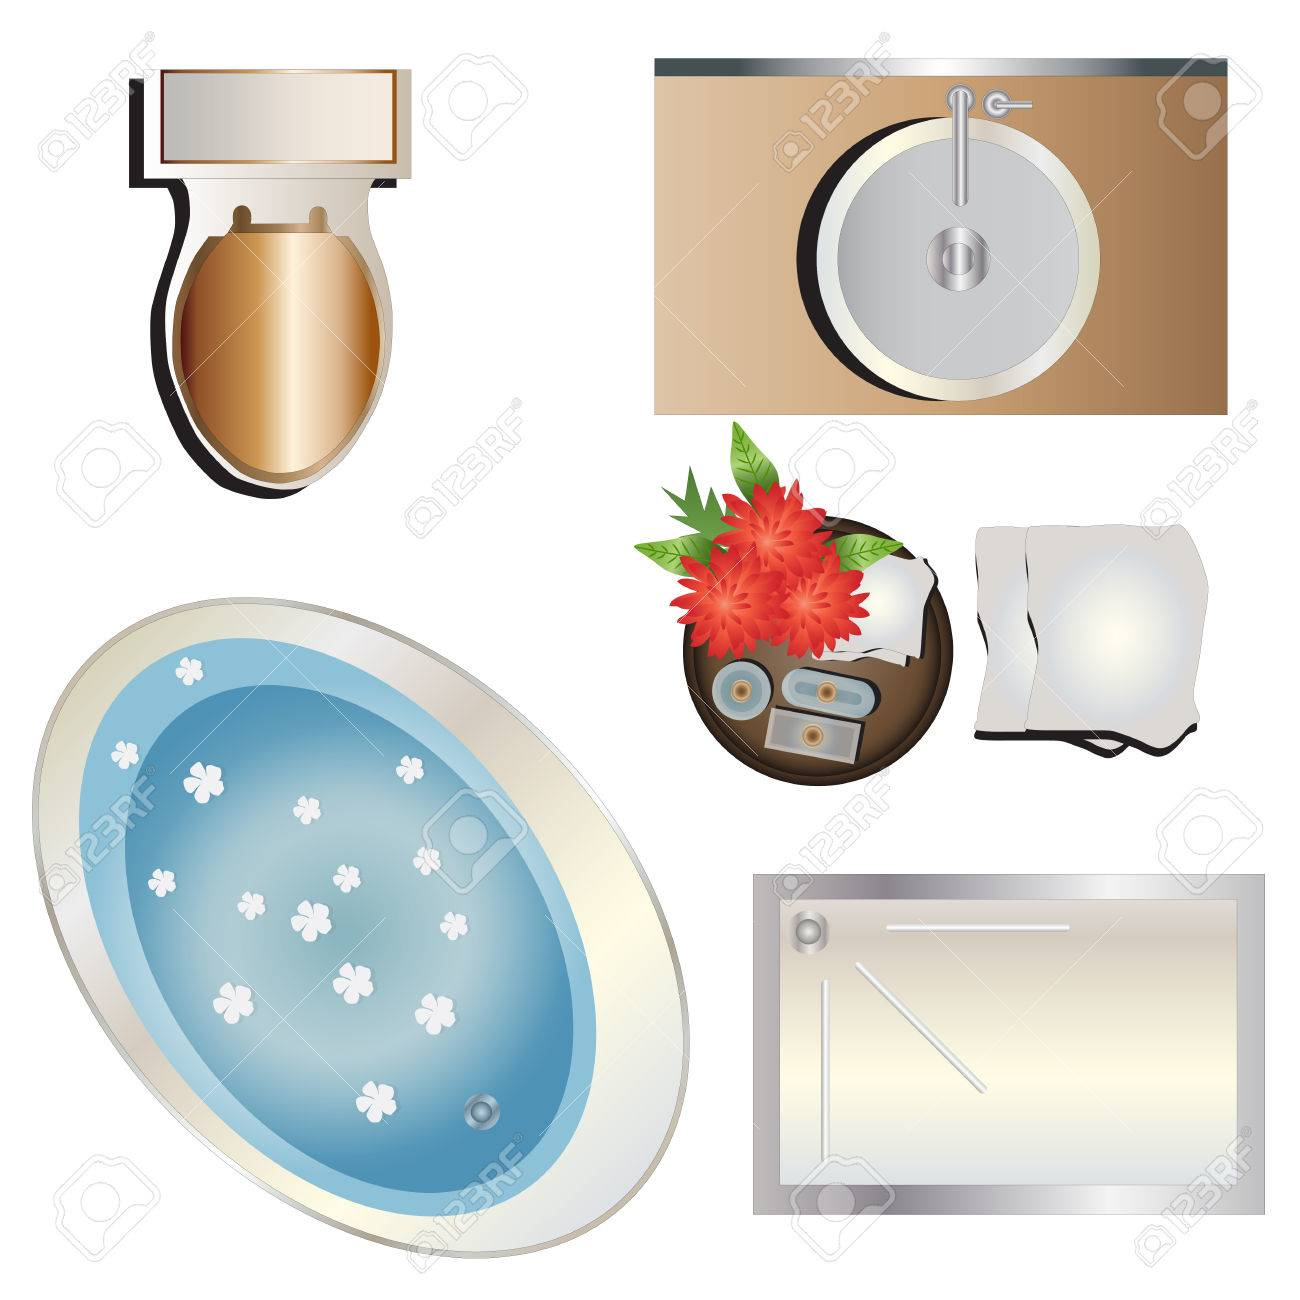 Bathroom Top View Set 6 For Interior Vector Illustration Stock